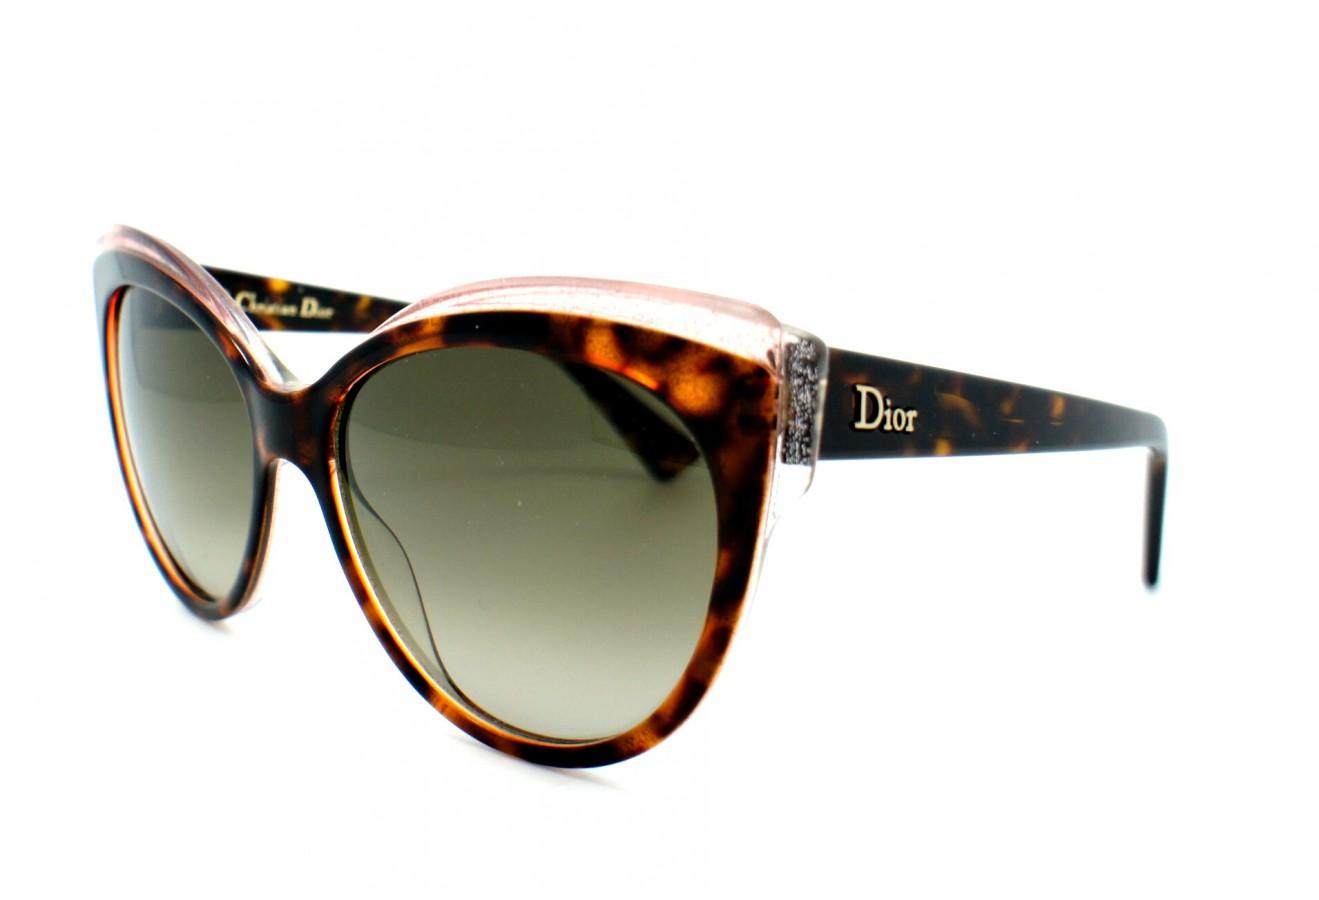 lunettes de soleil dior dior glisten 1 e59 ha 56 16. Black Bedroom Furniture Sets. Home Design Ideas